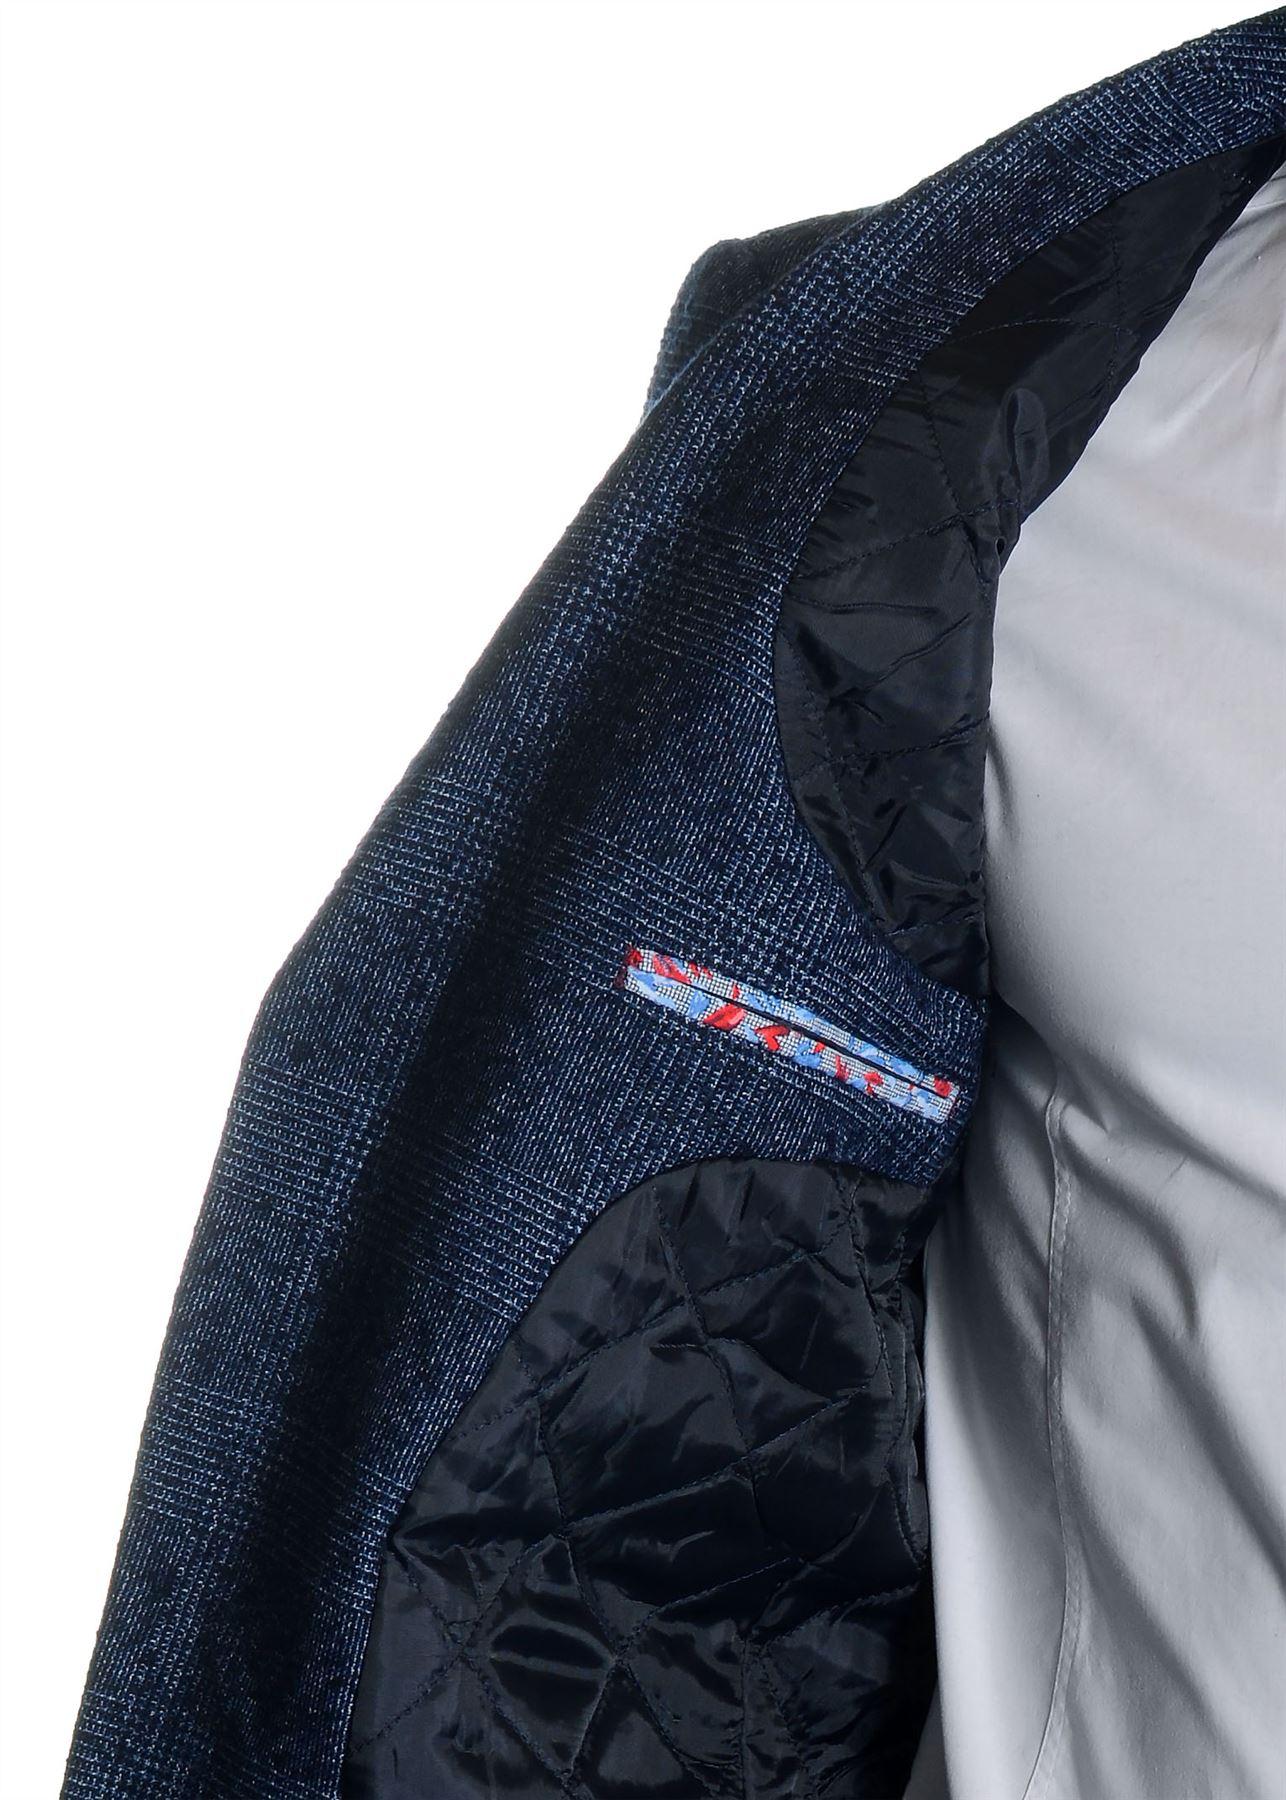 Men-039-s-Checkered-Coat-3-4-Long-Tweed-Cashmere-Wool-Trendy-Formal-Winter-Overcoat thumbnail 9